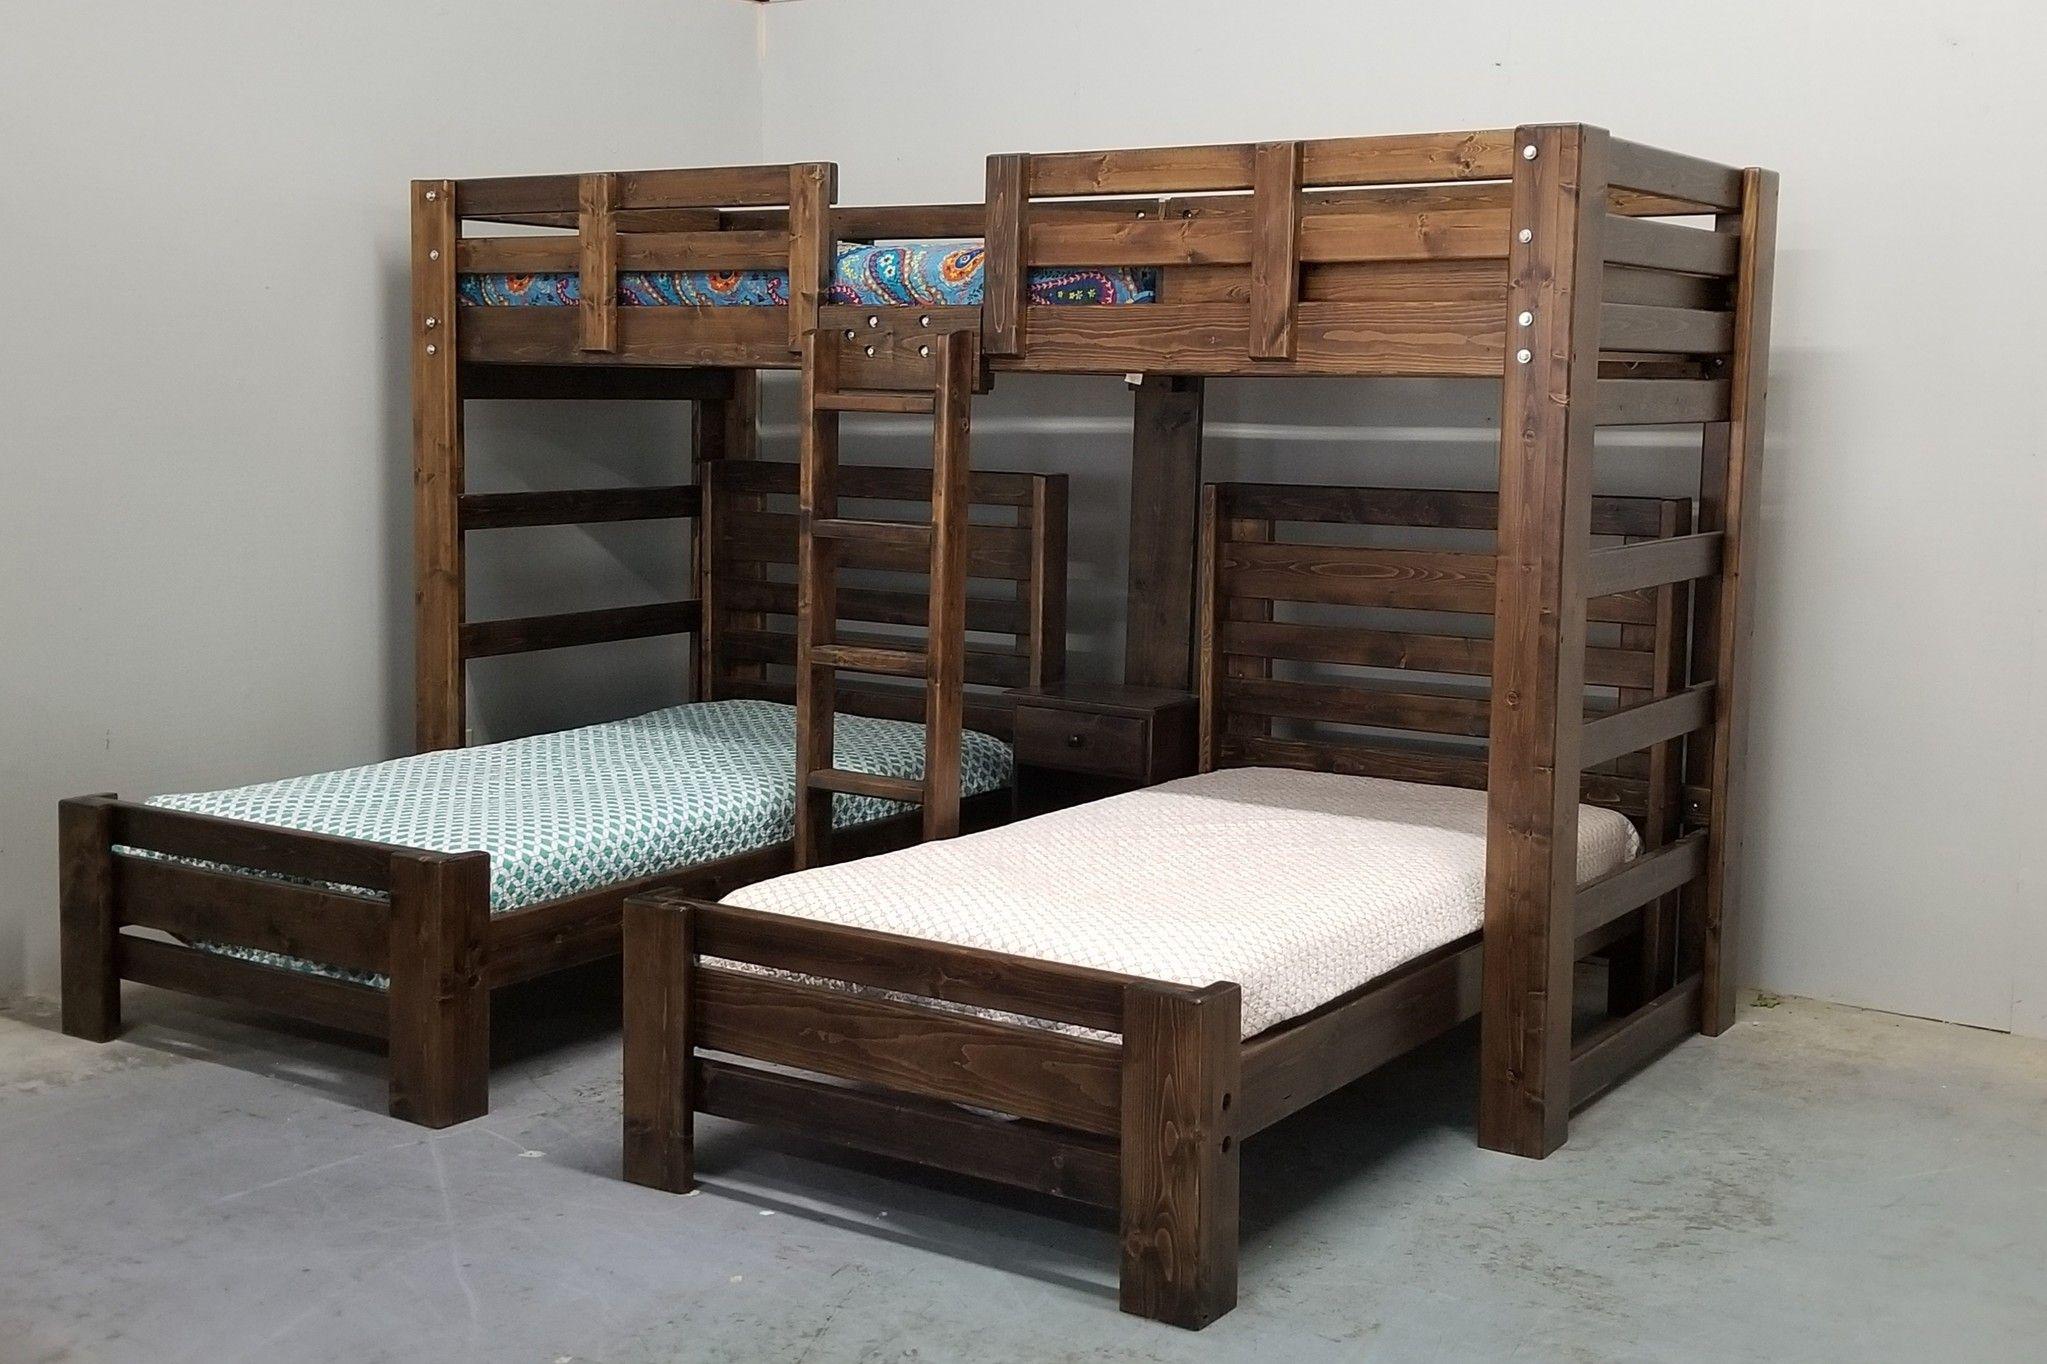 Bargain Bunks Hat Trick Triple Bunk W 2 Plank Beds Diy Bunk Bed